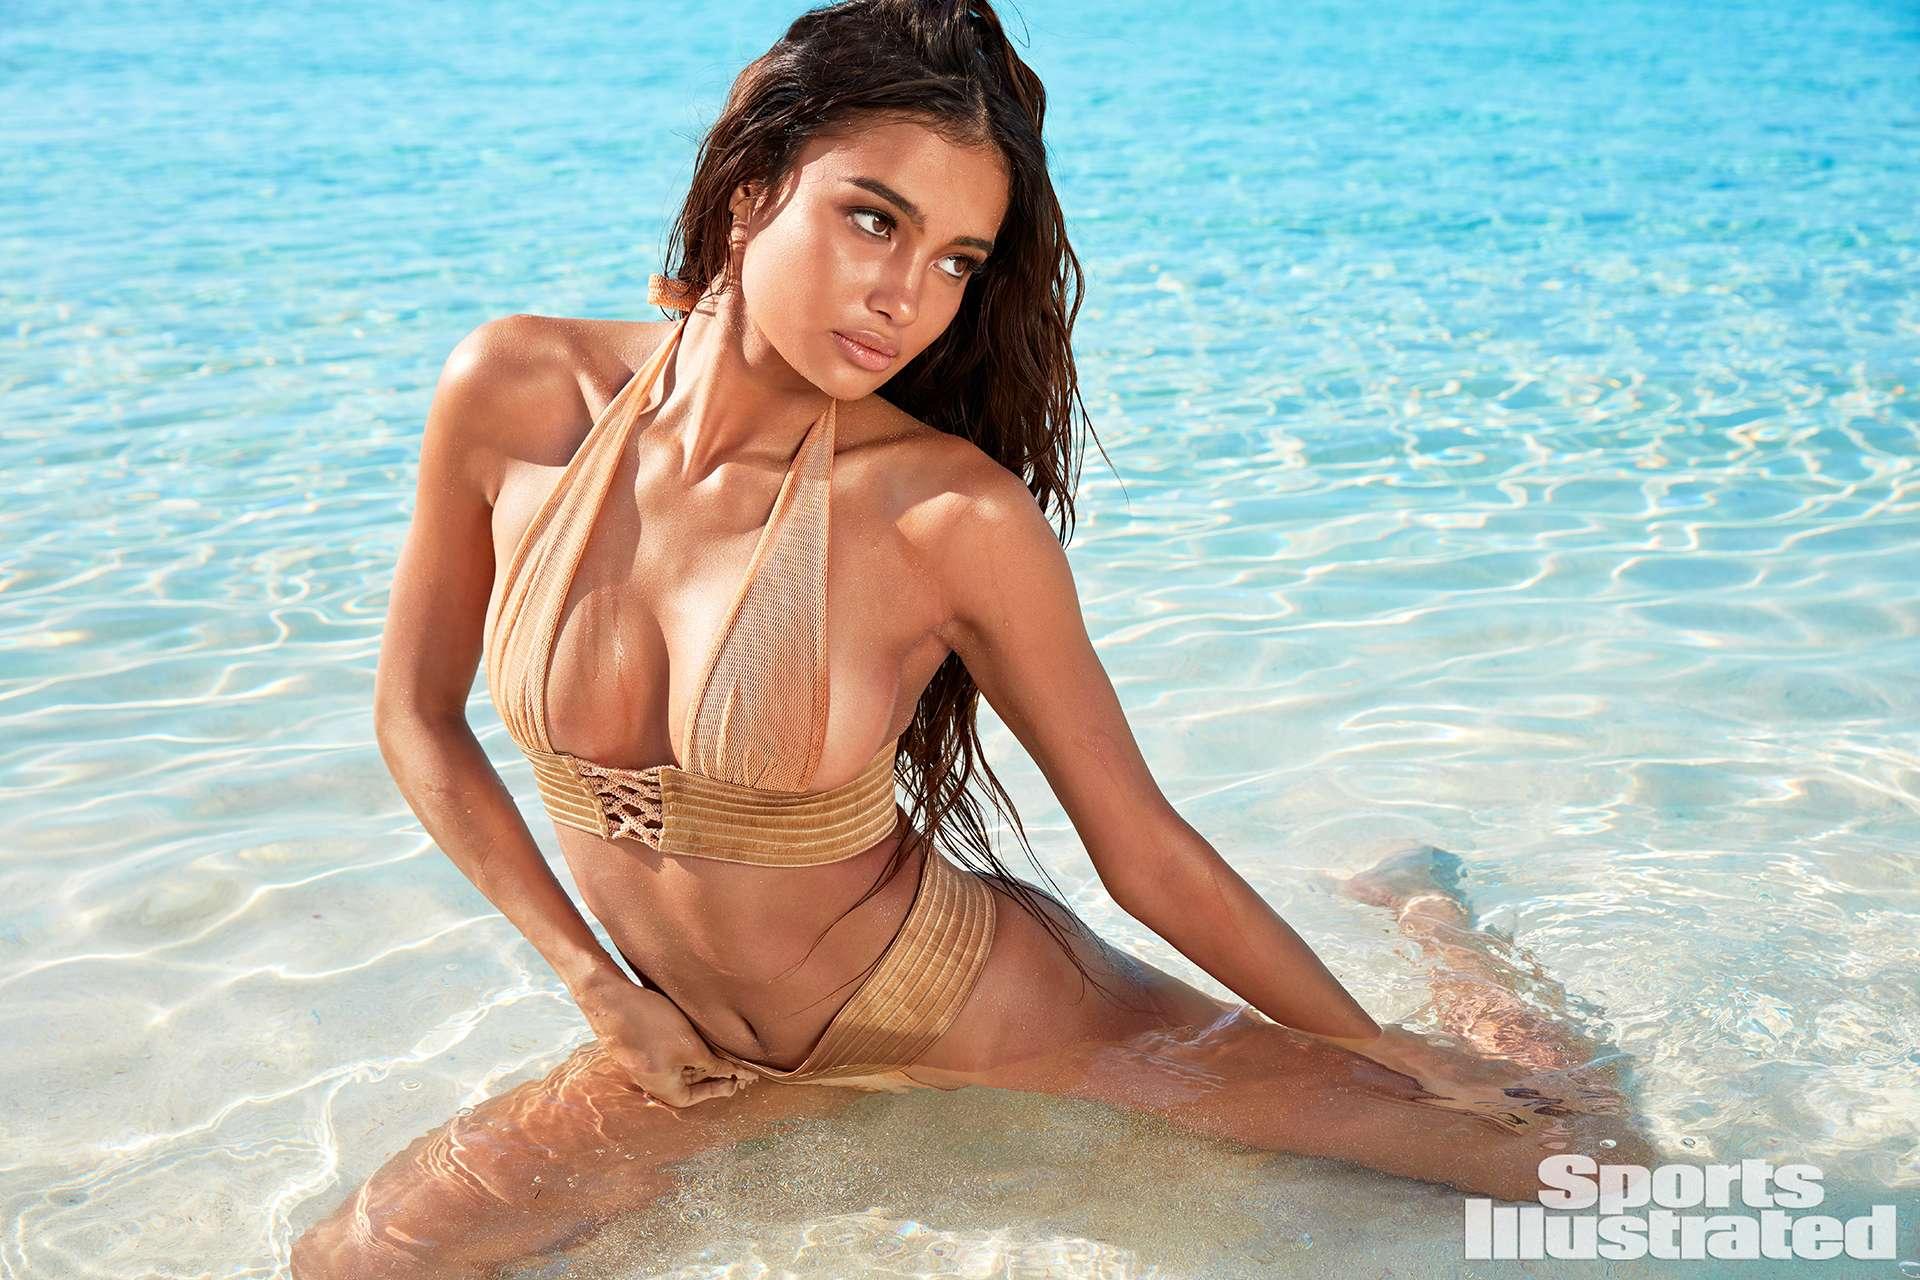 Great Exuma: Kelsey Merritt für die Sports Illustrated Swimsuit Issue 6